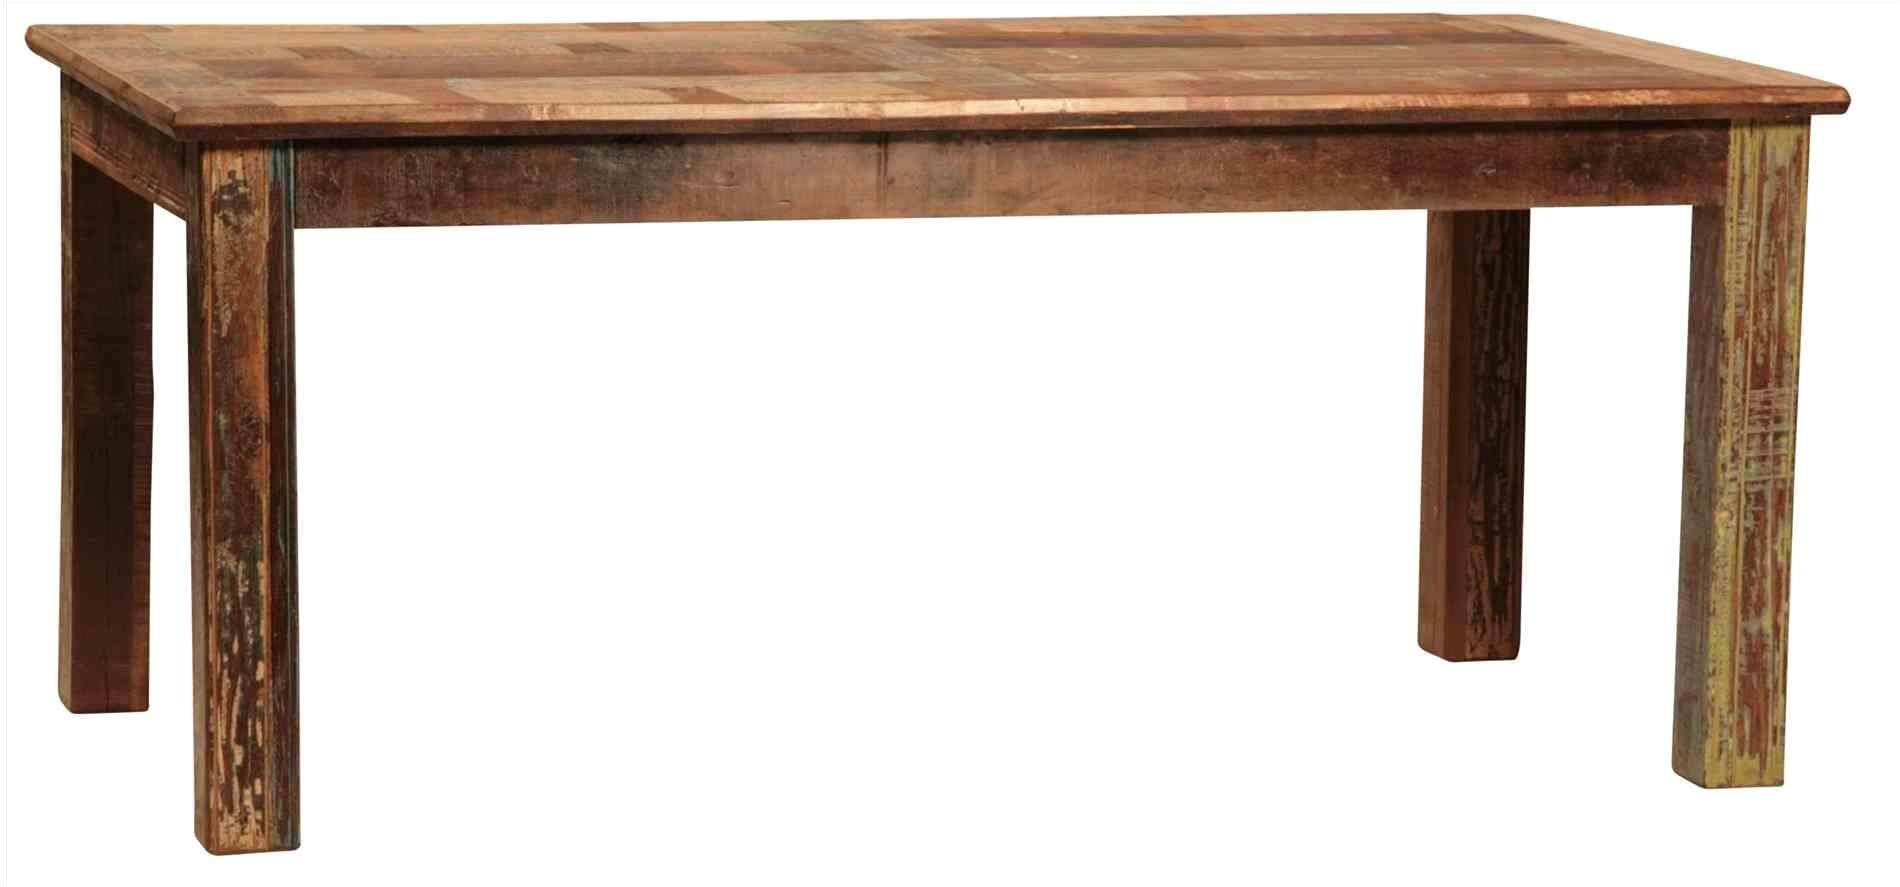 gallery of gerard furniture baton rouge room galeries acadiana baton rouge u lafayette la kitchen tables and louisiana